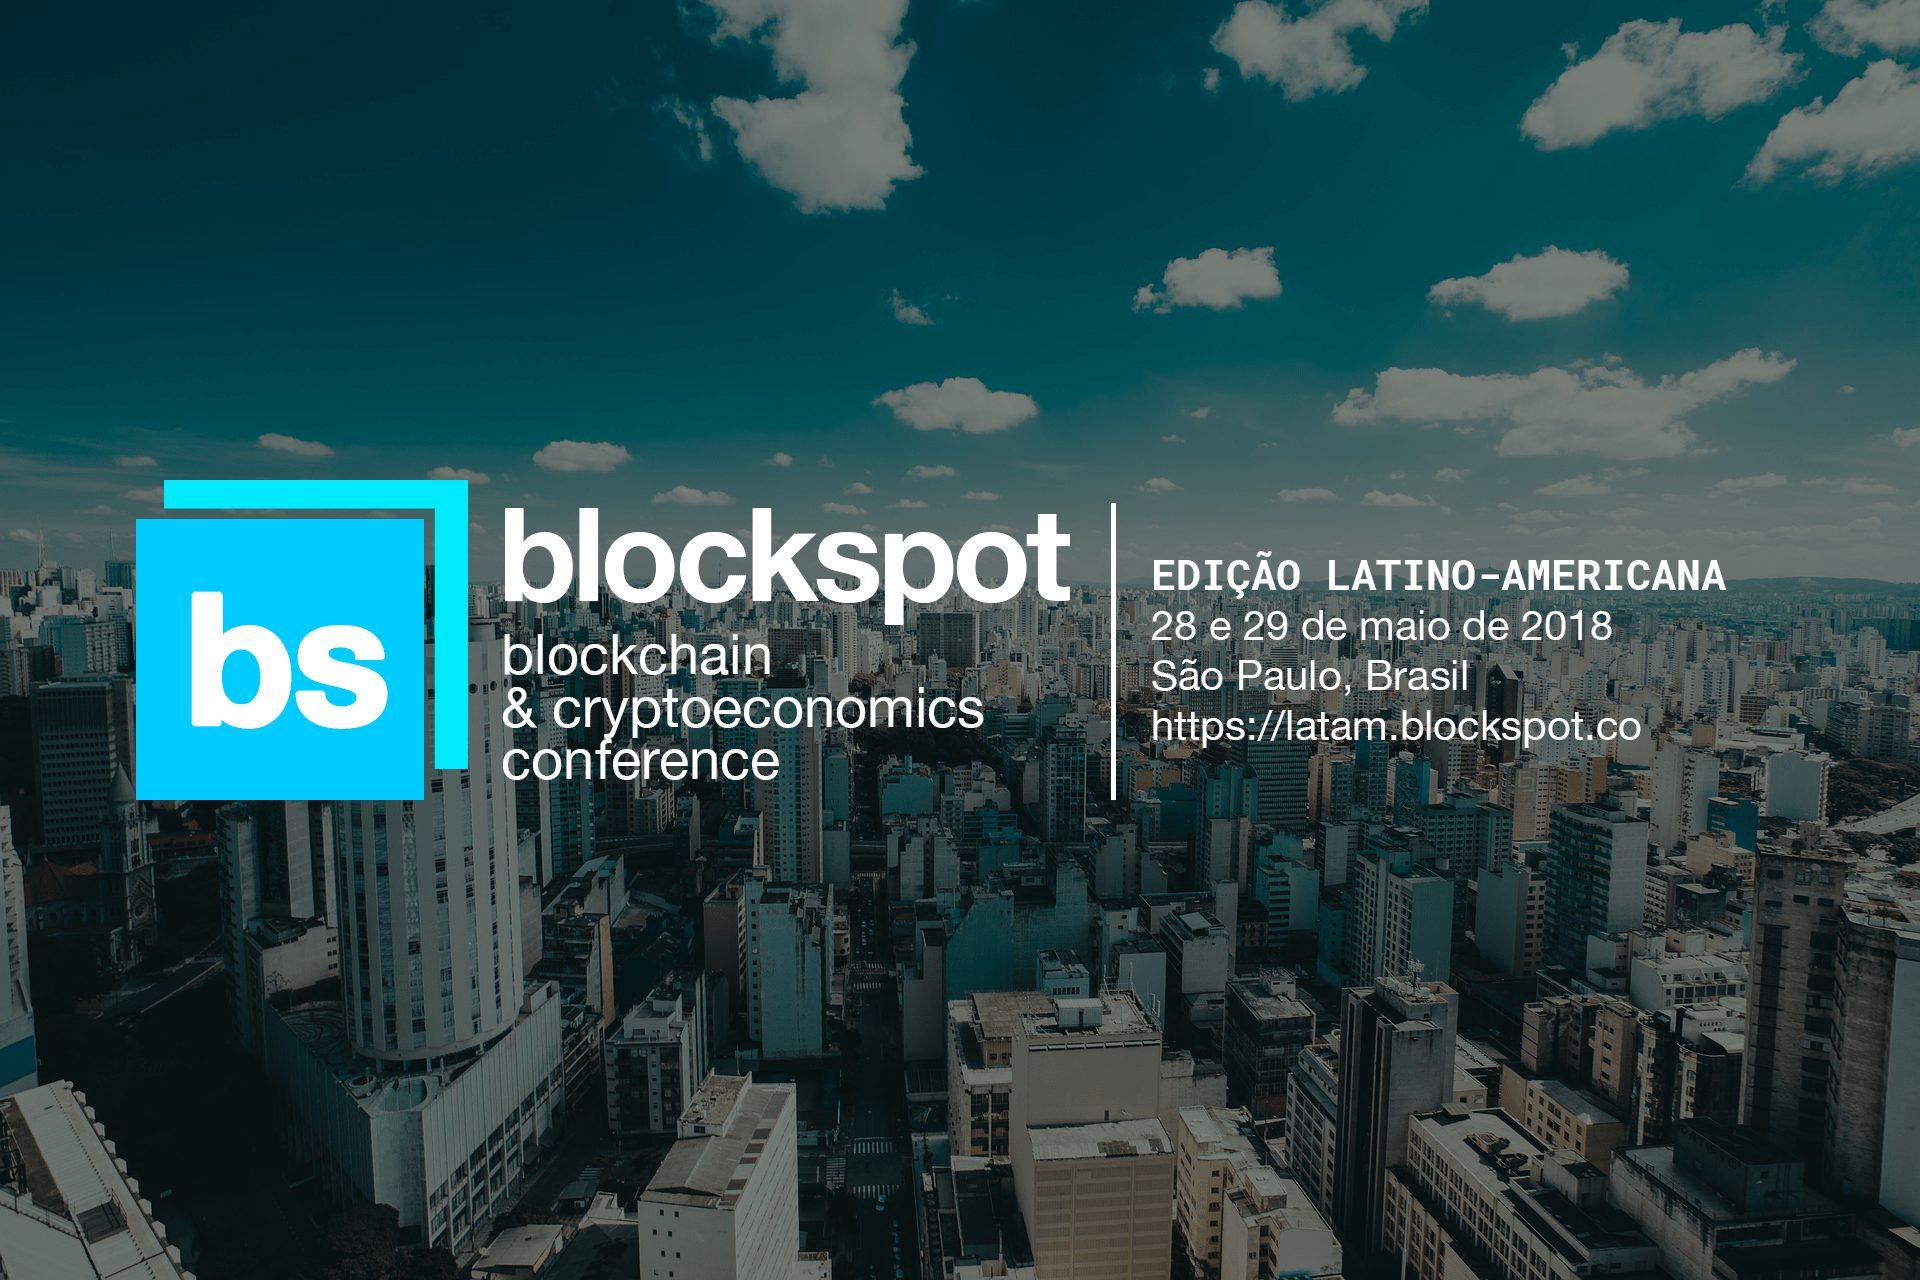 blockspot conference foxbit